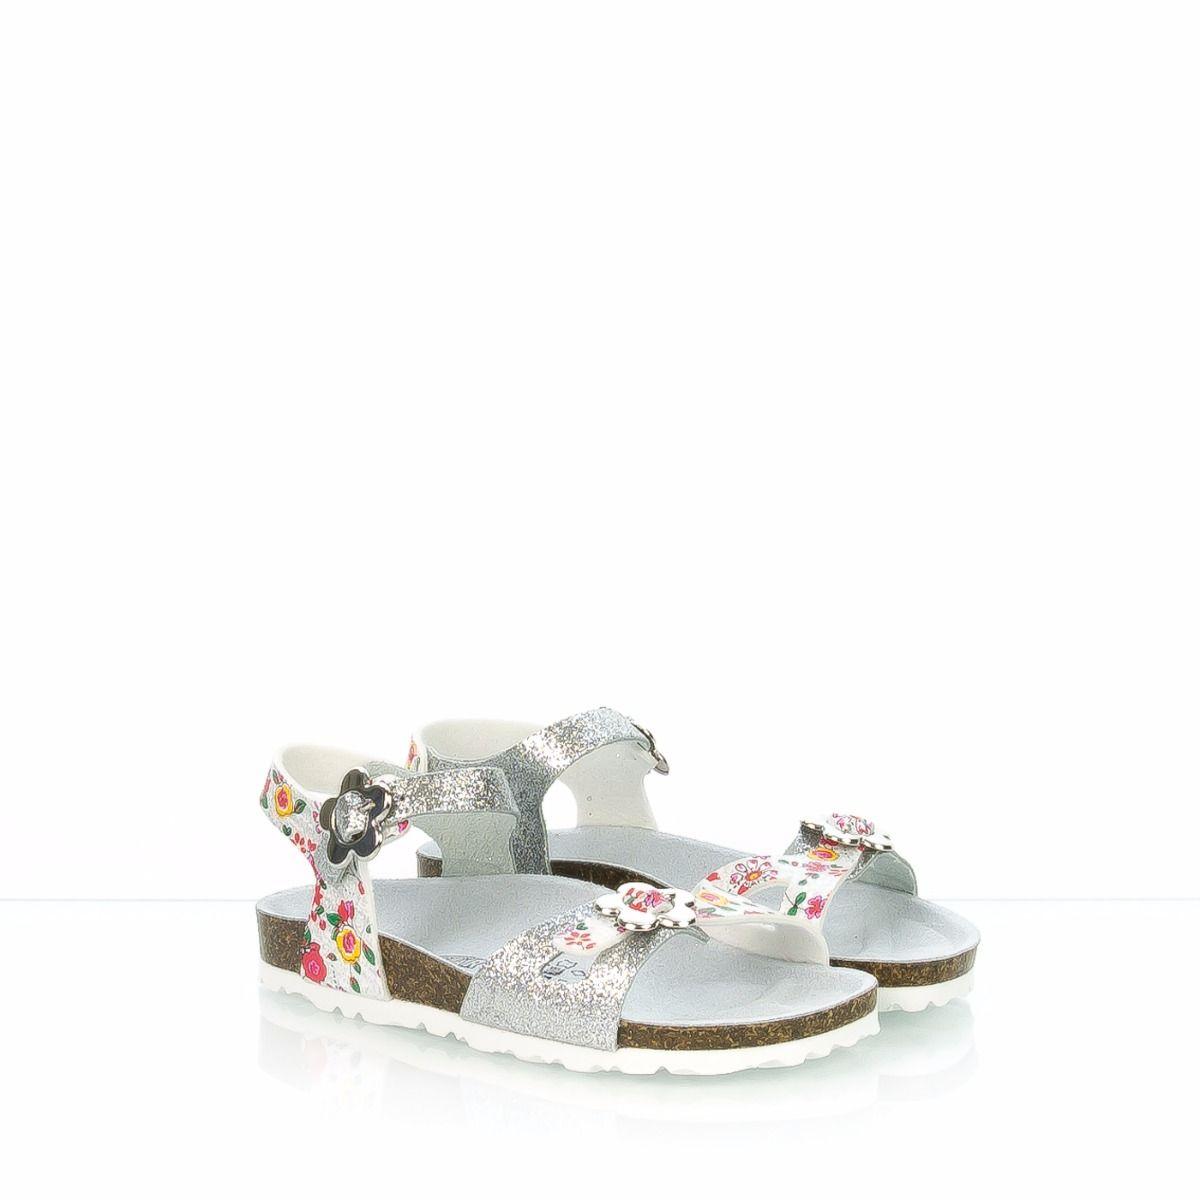 Sandalo da bambina GOLDSTAR argento glitter e fiori 52d4900f084